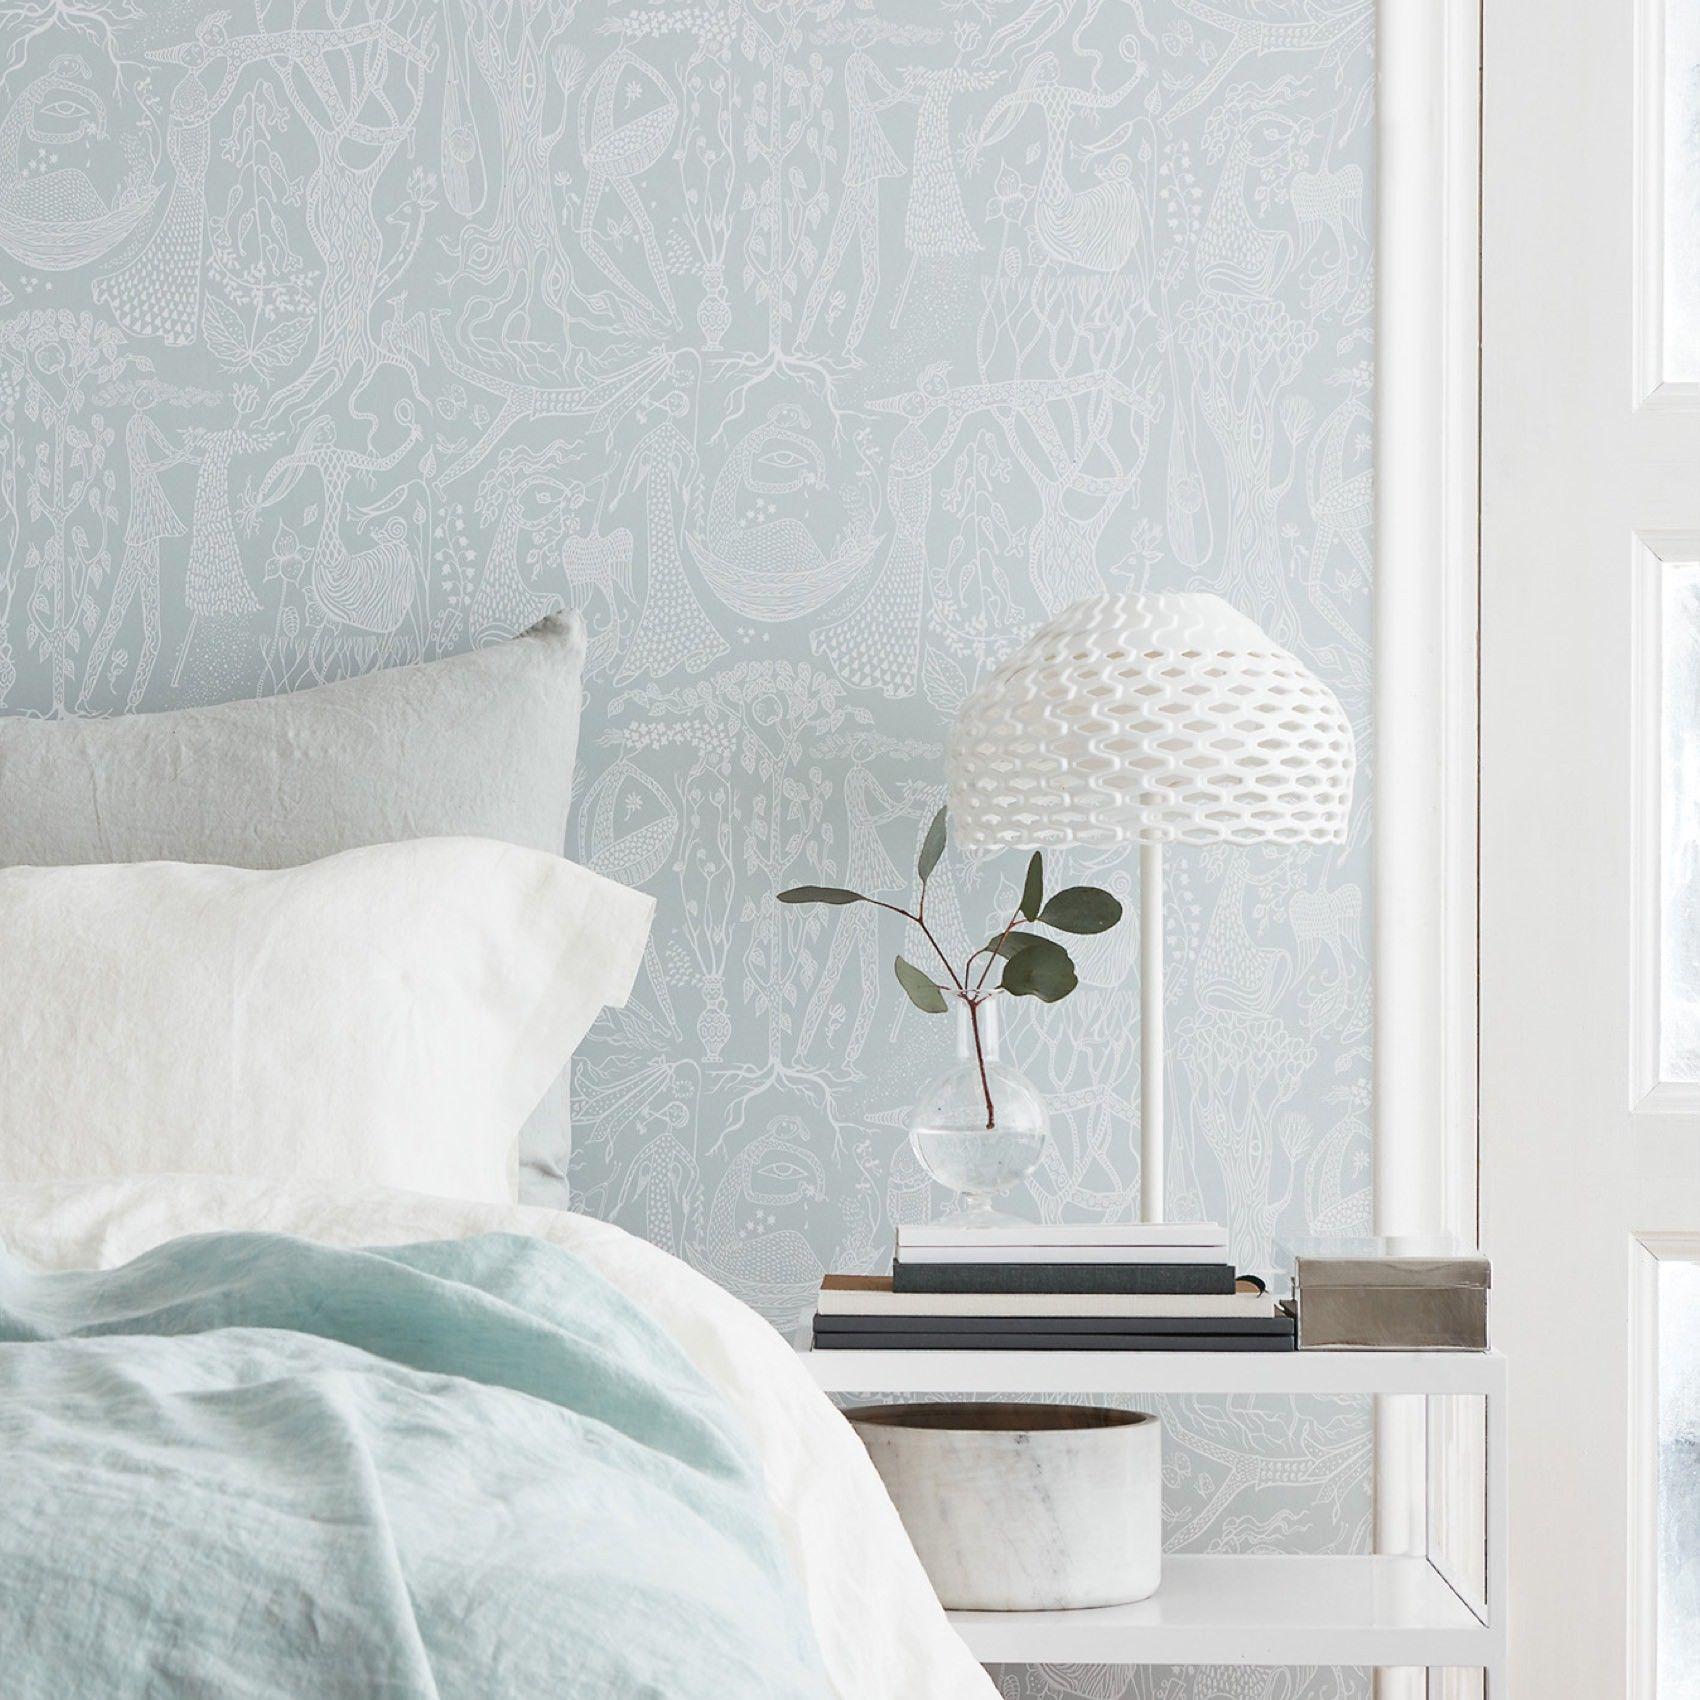 Design, wallpapers and ux/ui designer on pinterest